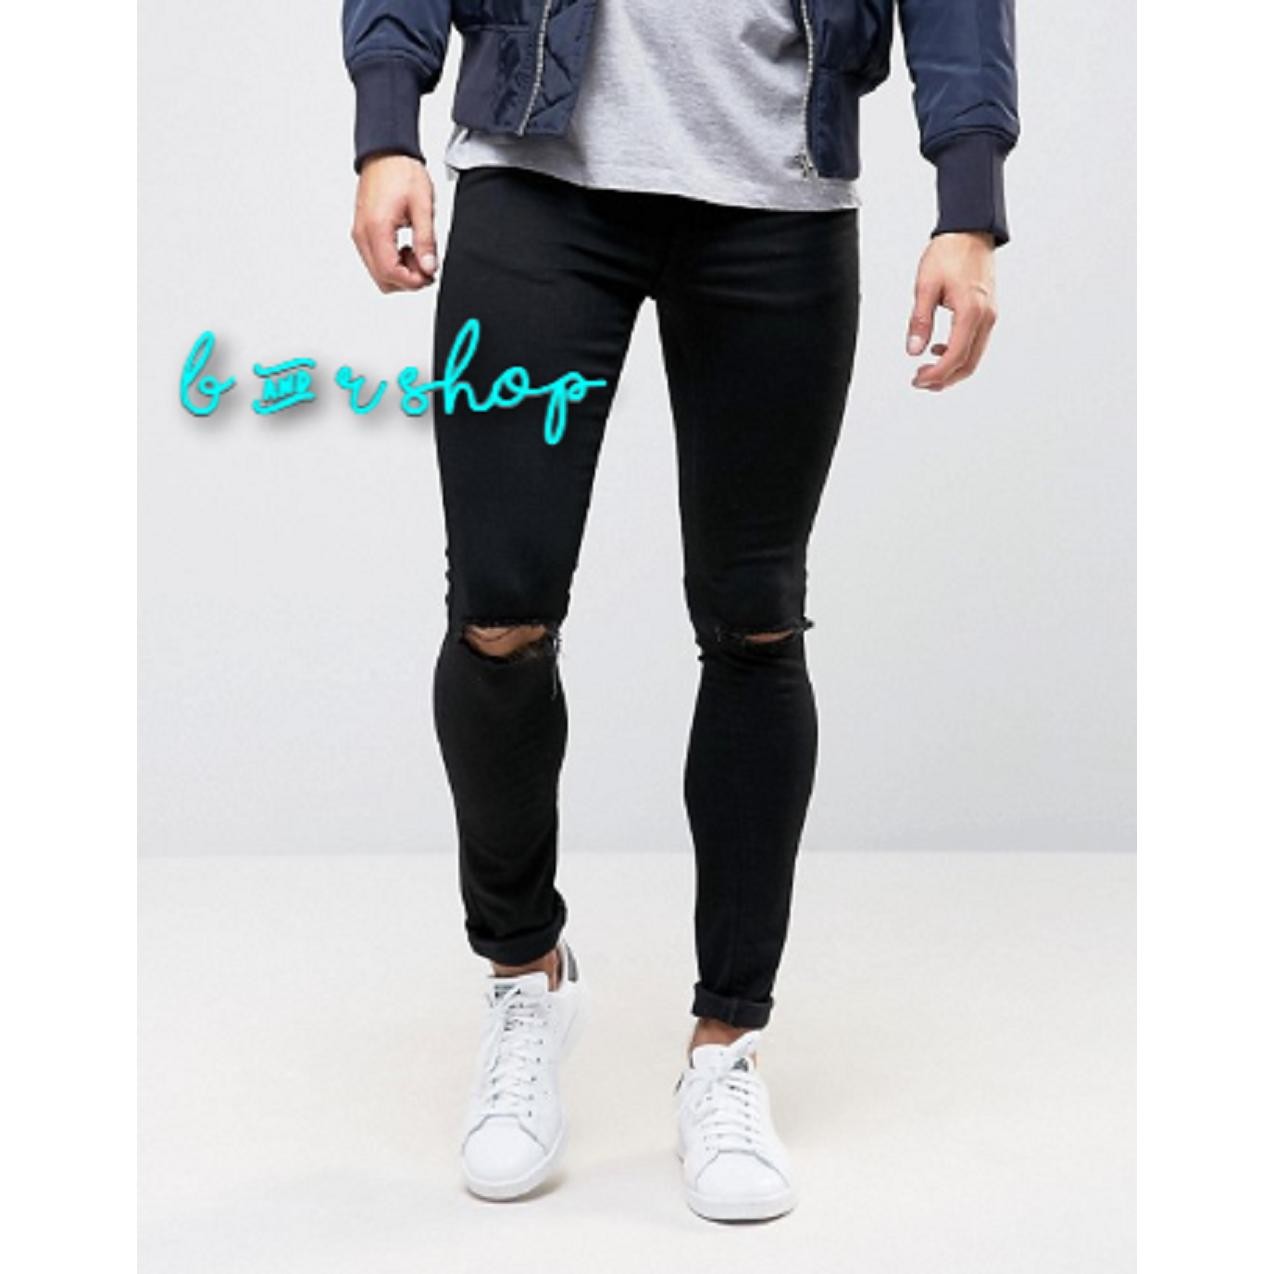 B & R SHOP - Celana Jeans Lois Skinny / Jeans Pria Ripped Sobek Hitam / Jeans Pria Sobek / Jeans Sobek Pria / Jeans Pria / Jeans Rips / Jeans Robek / Jins Sobek / Jins Robek / Jins Ripped